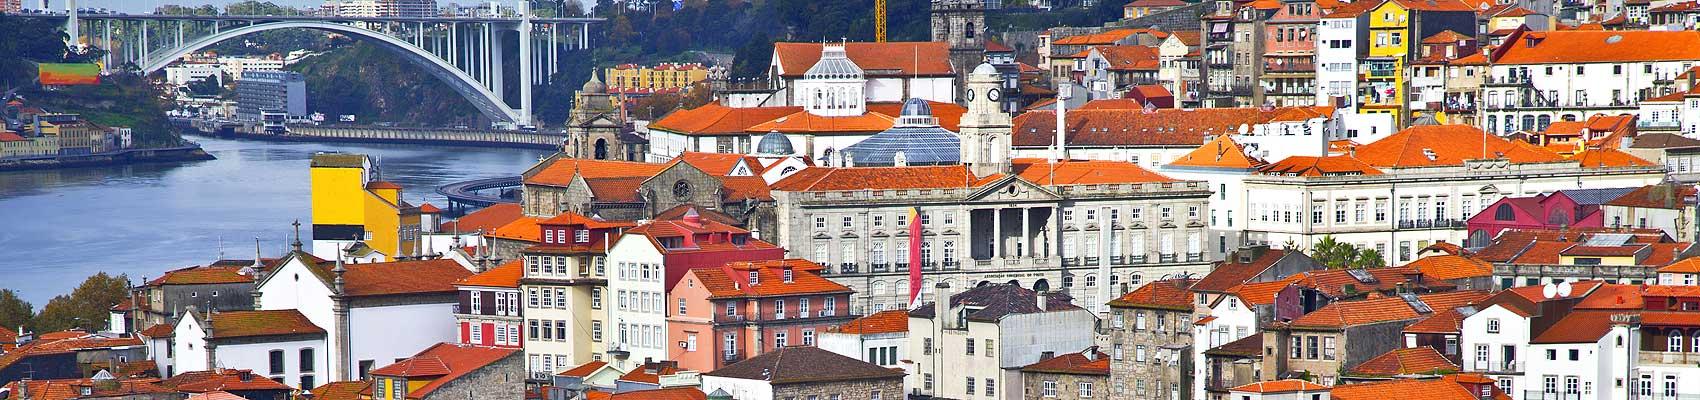 portugal-1700-2